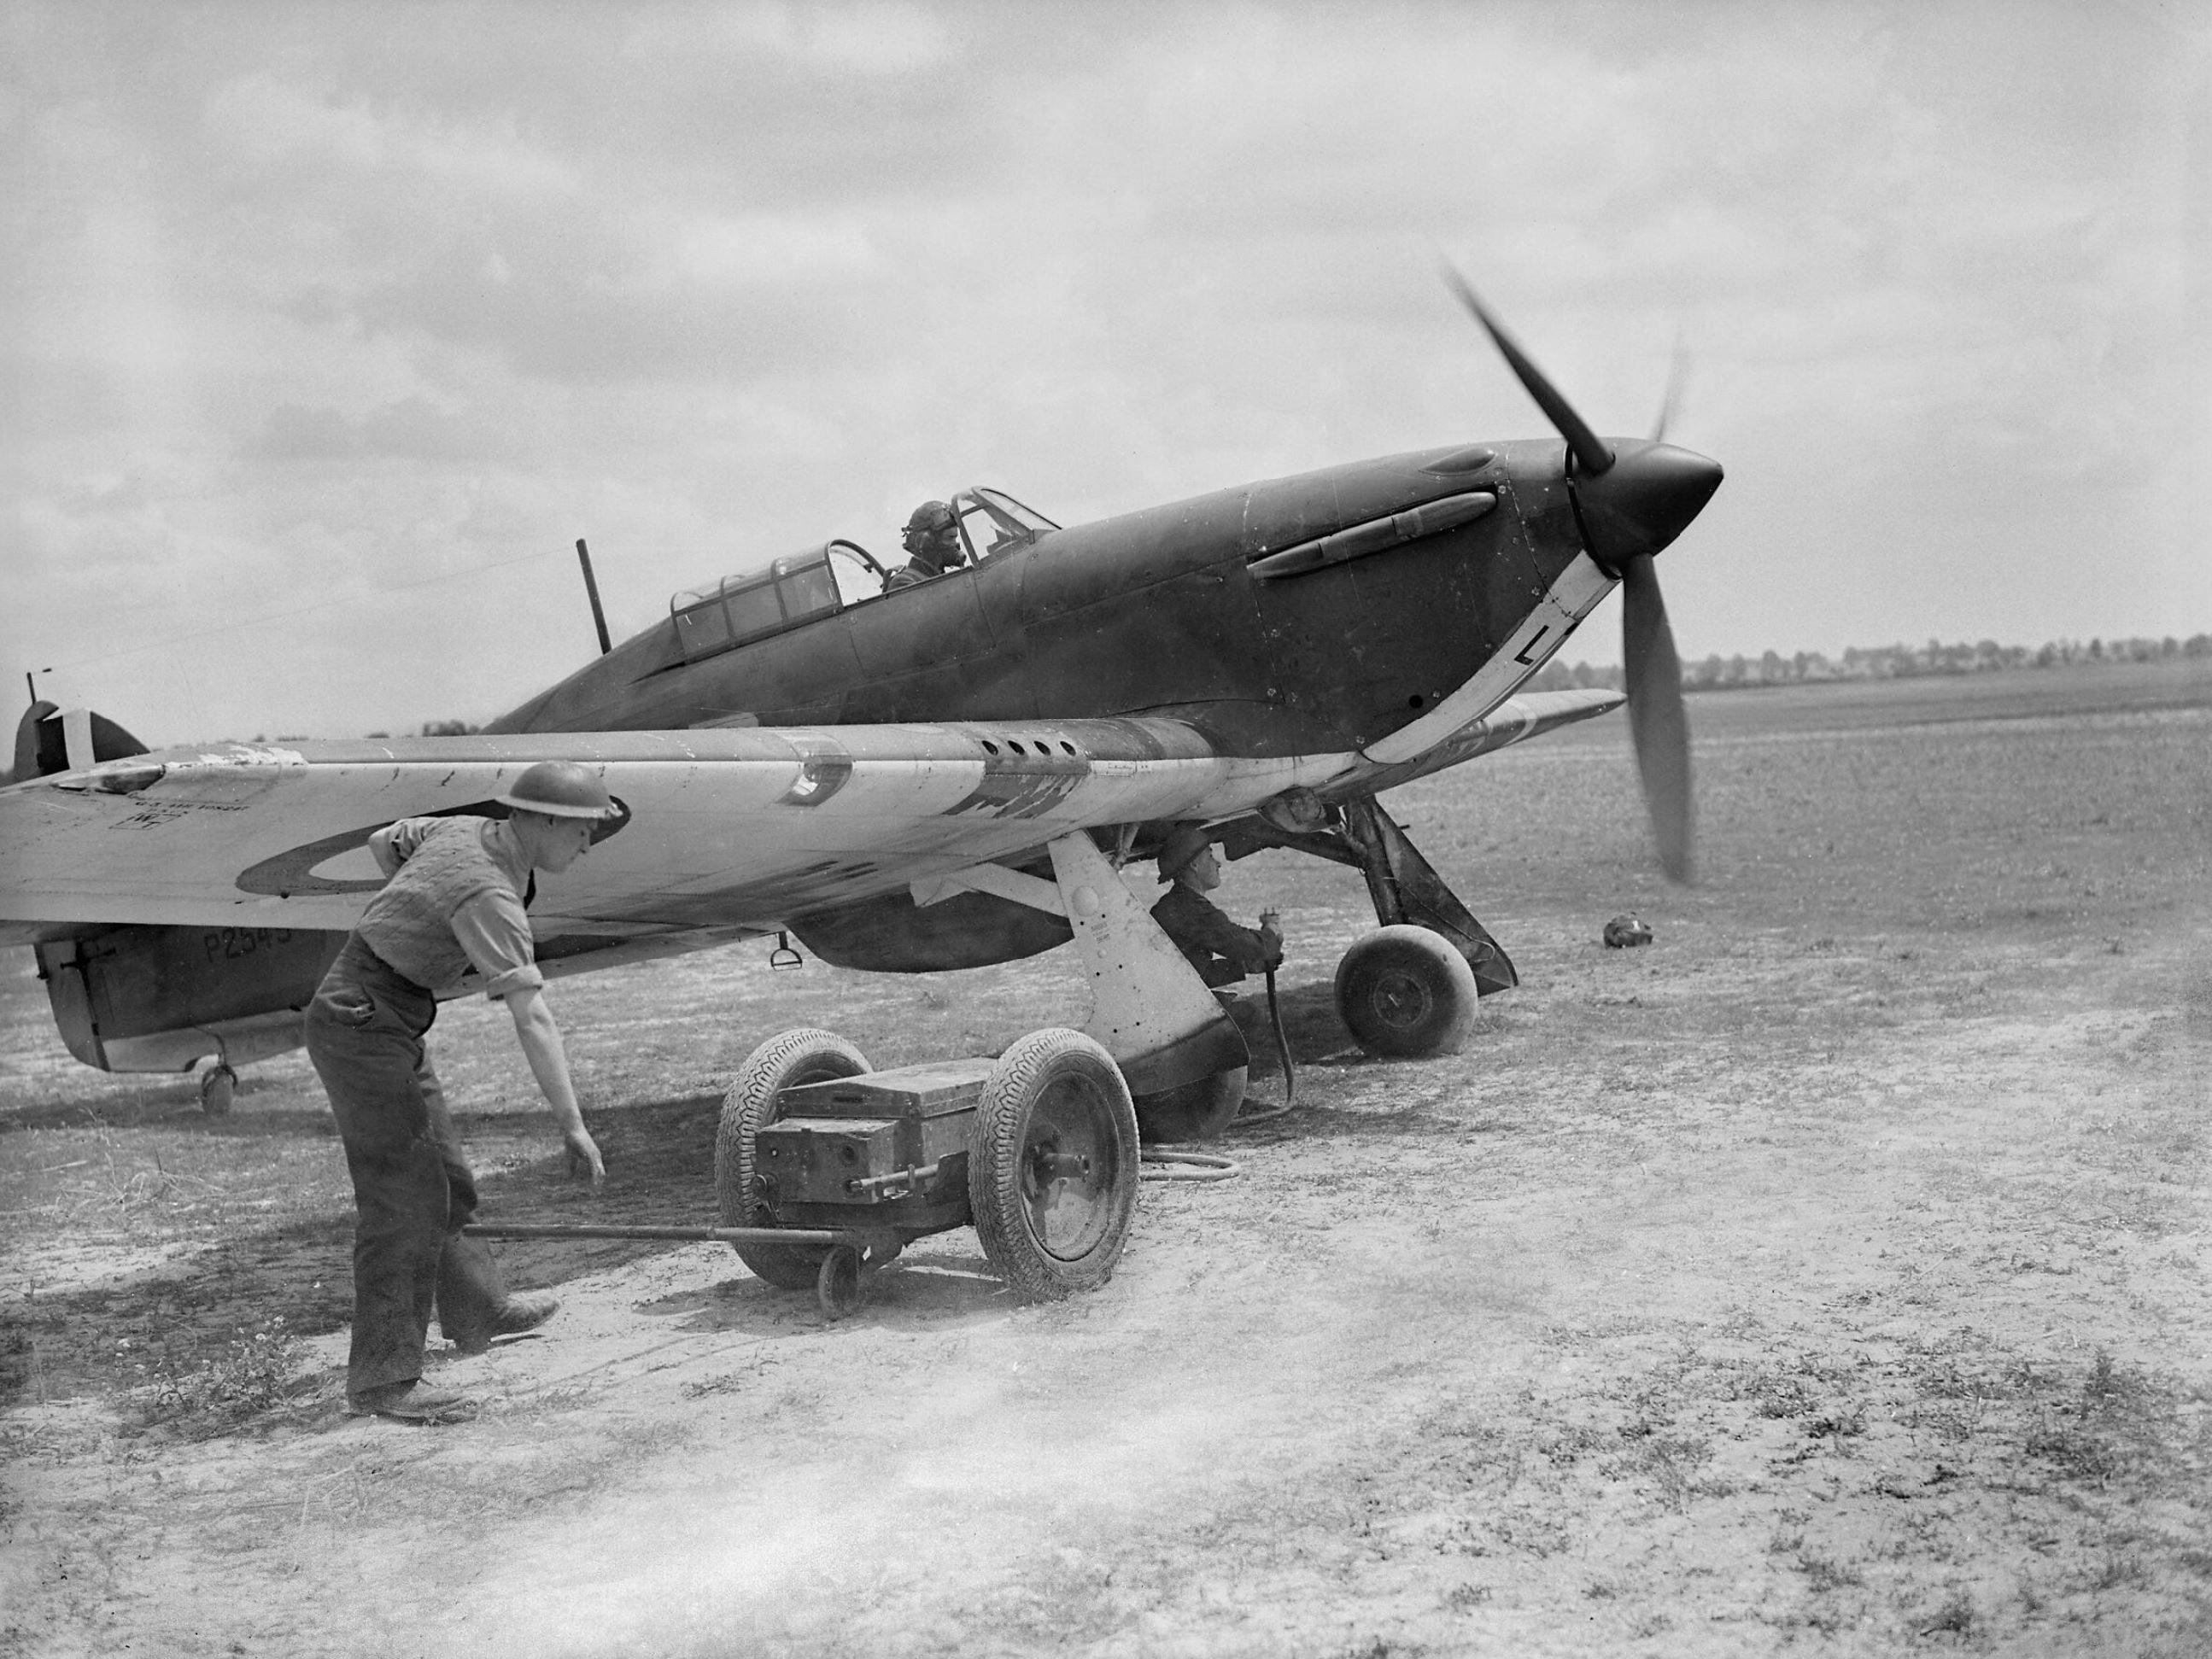 Hawker Hurricane RAF 501Sqn SDL at Bethenville France 11th May 1940 IWM C1682